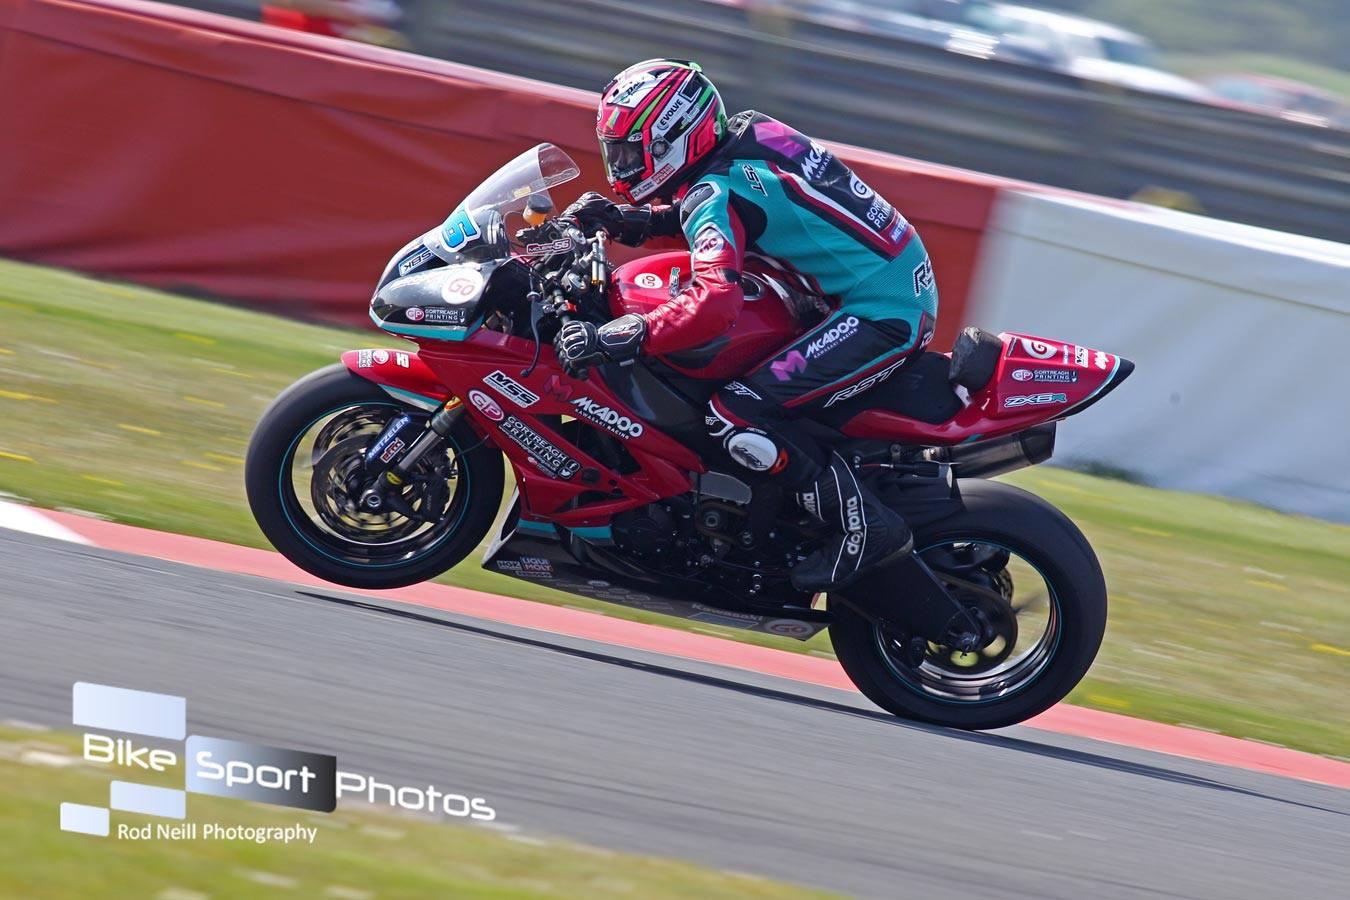 Road Racer's Adventures: McLean Banks Back To Back Supersport Victories At Bishopcourt